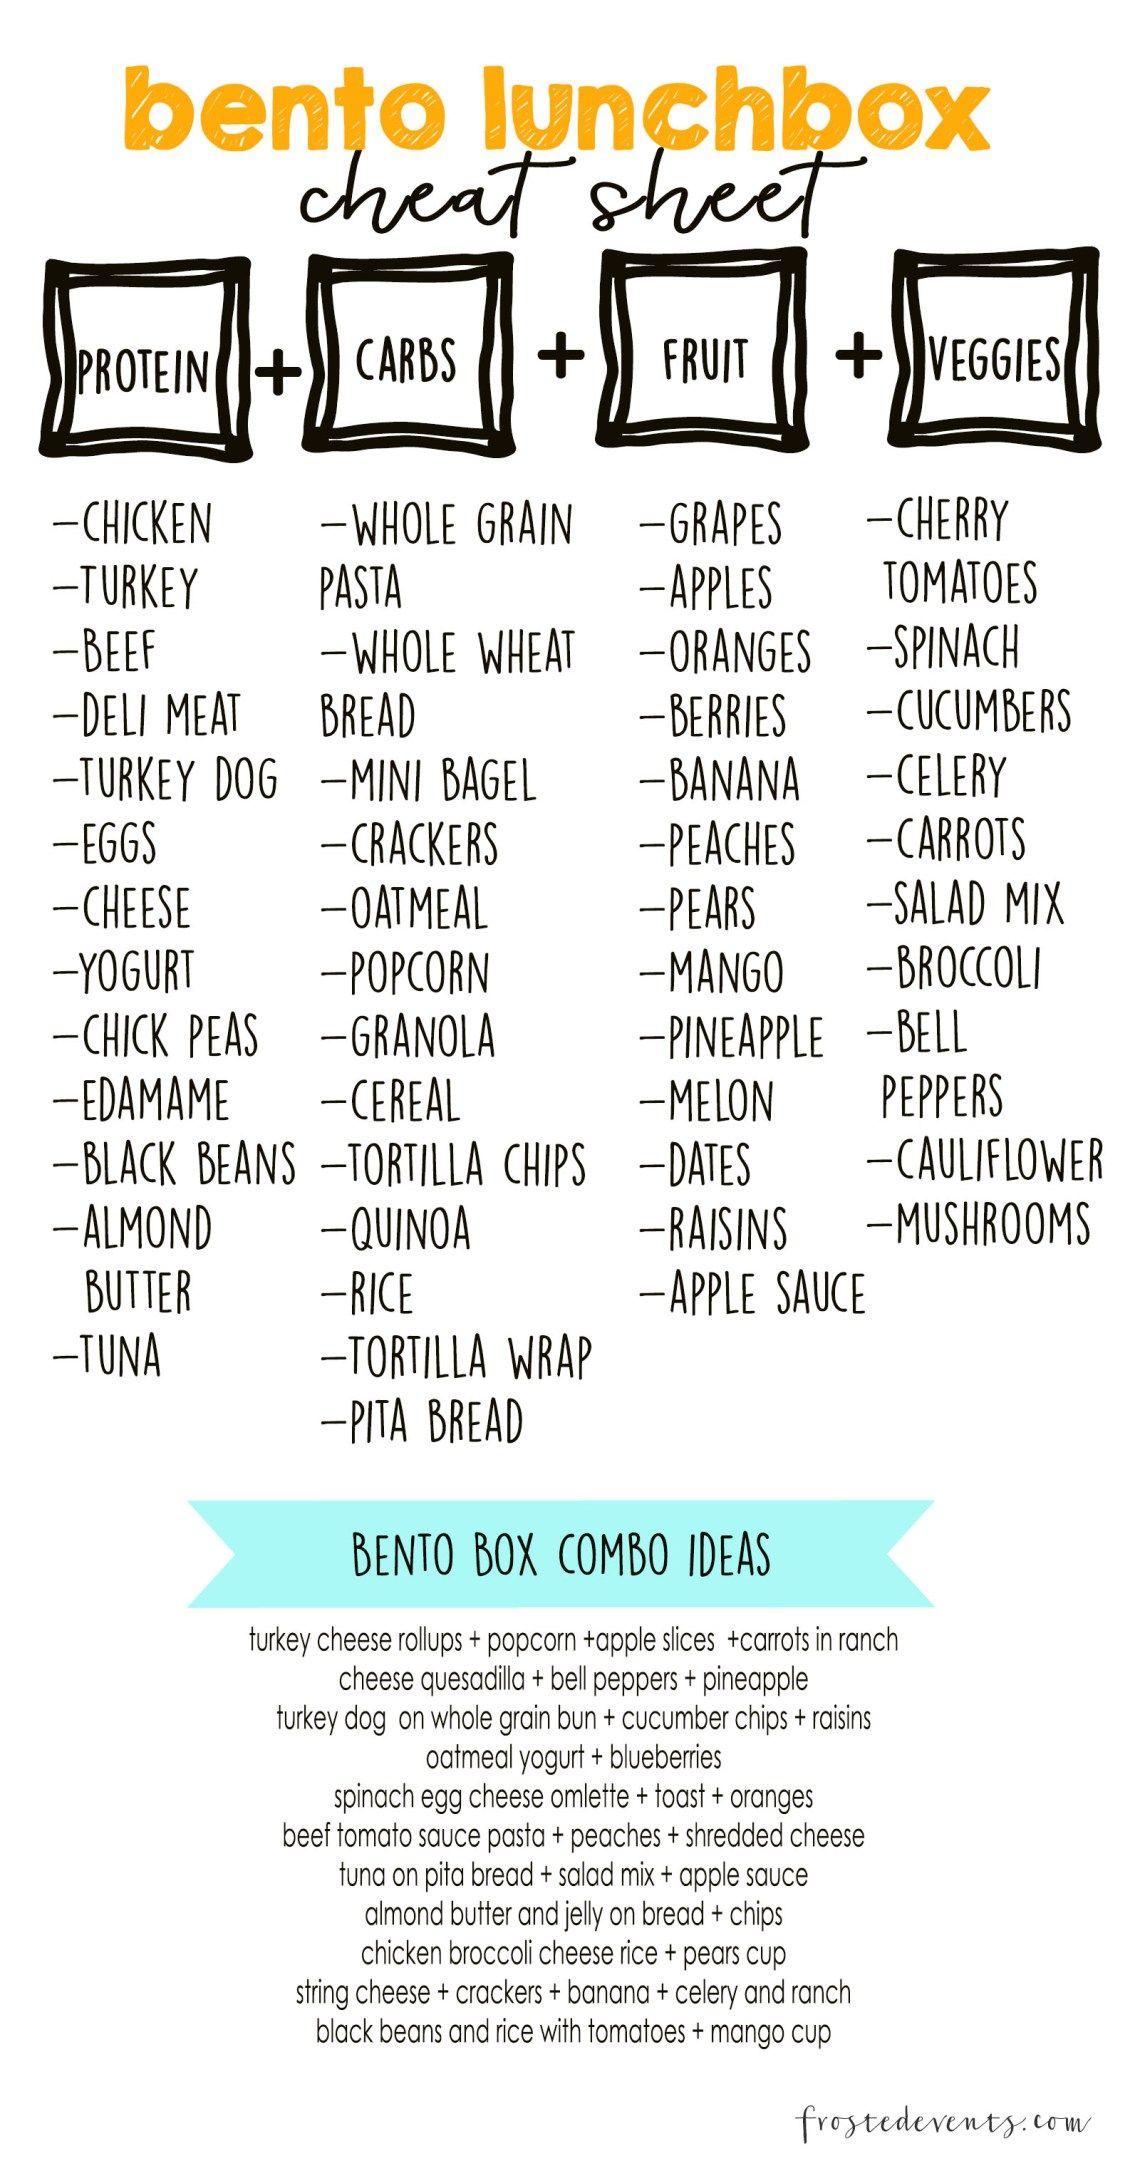 Bento Box Lunch Ideas Cheat Sheet